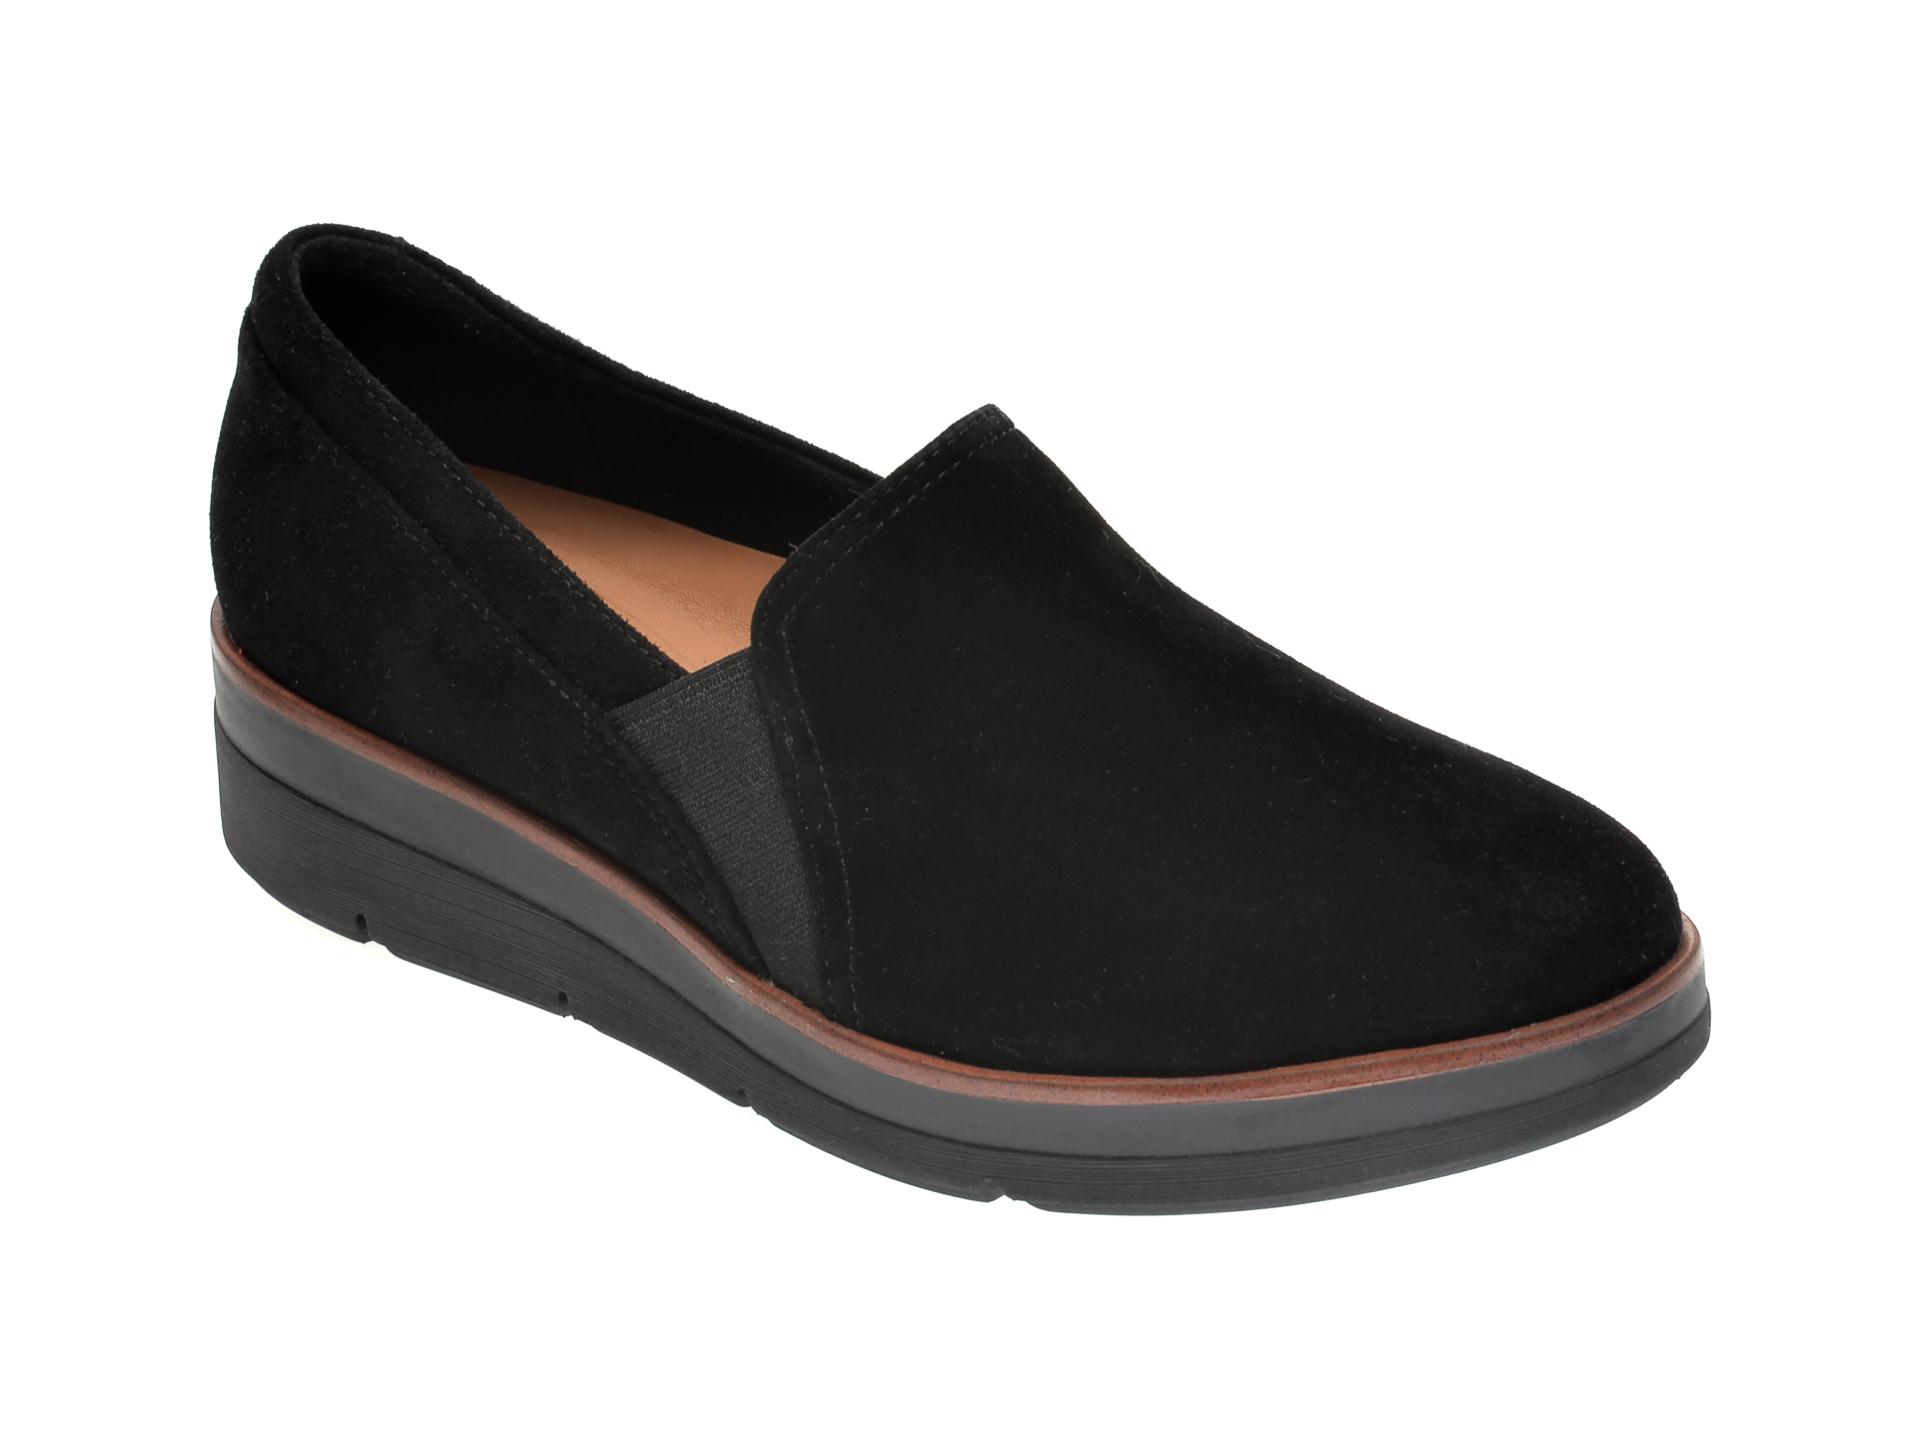 Pantofi CLARKS negri, SHAYLIN AVE, din piele intoarsa imagine